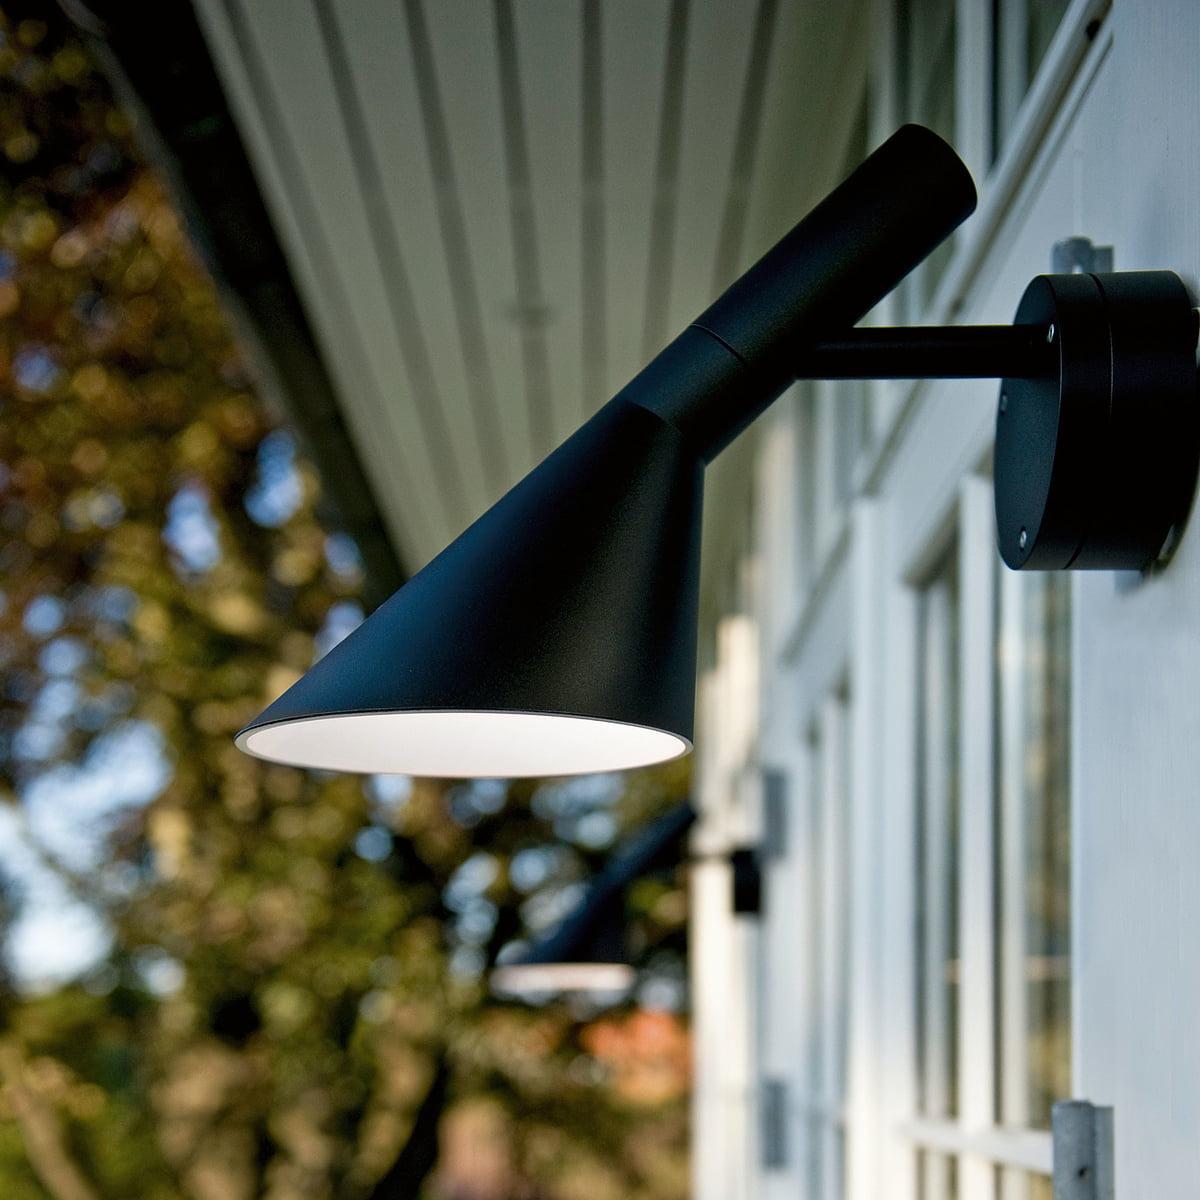 Aj outdoor wall light led by louis poulsen louis poulsen aj outdoor wall light led workwithnaturefo